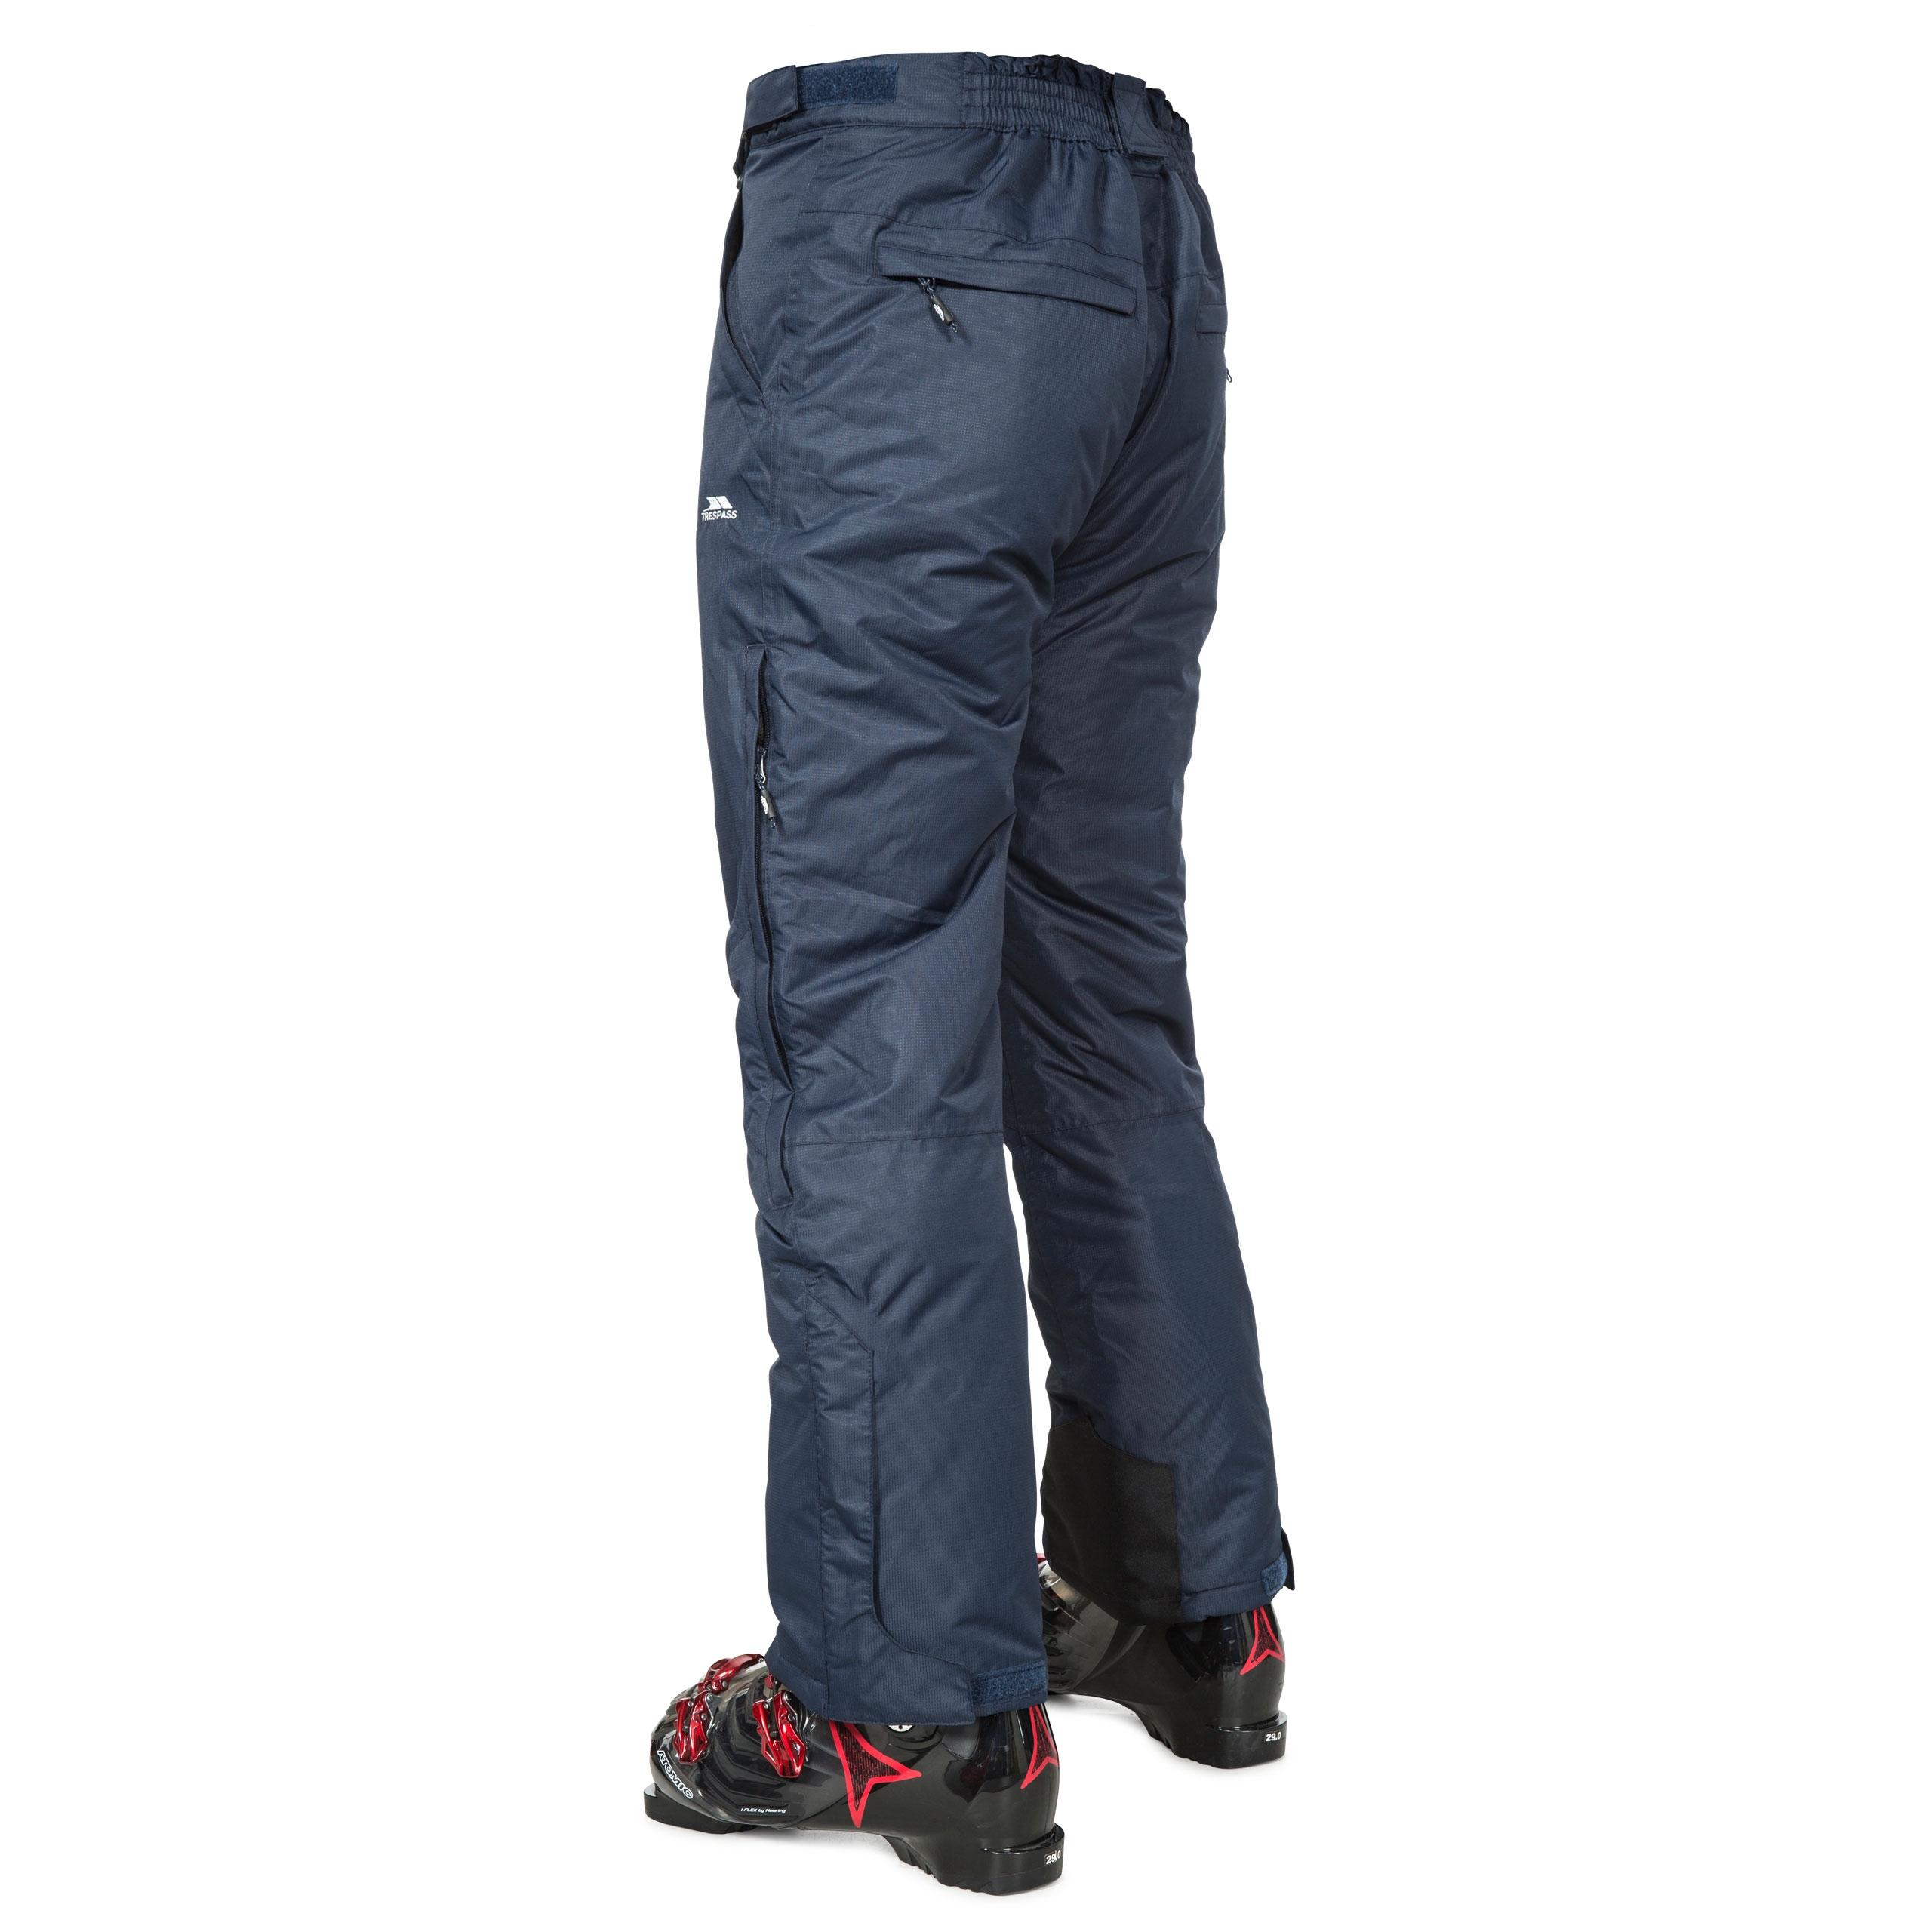 Trespass-Bezzy-Mens-Waterproof-Ski-Pants-Snowboarding-Salopettes-with-Braces thumbnail 22